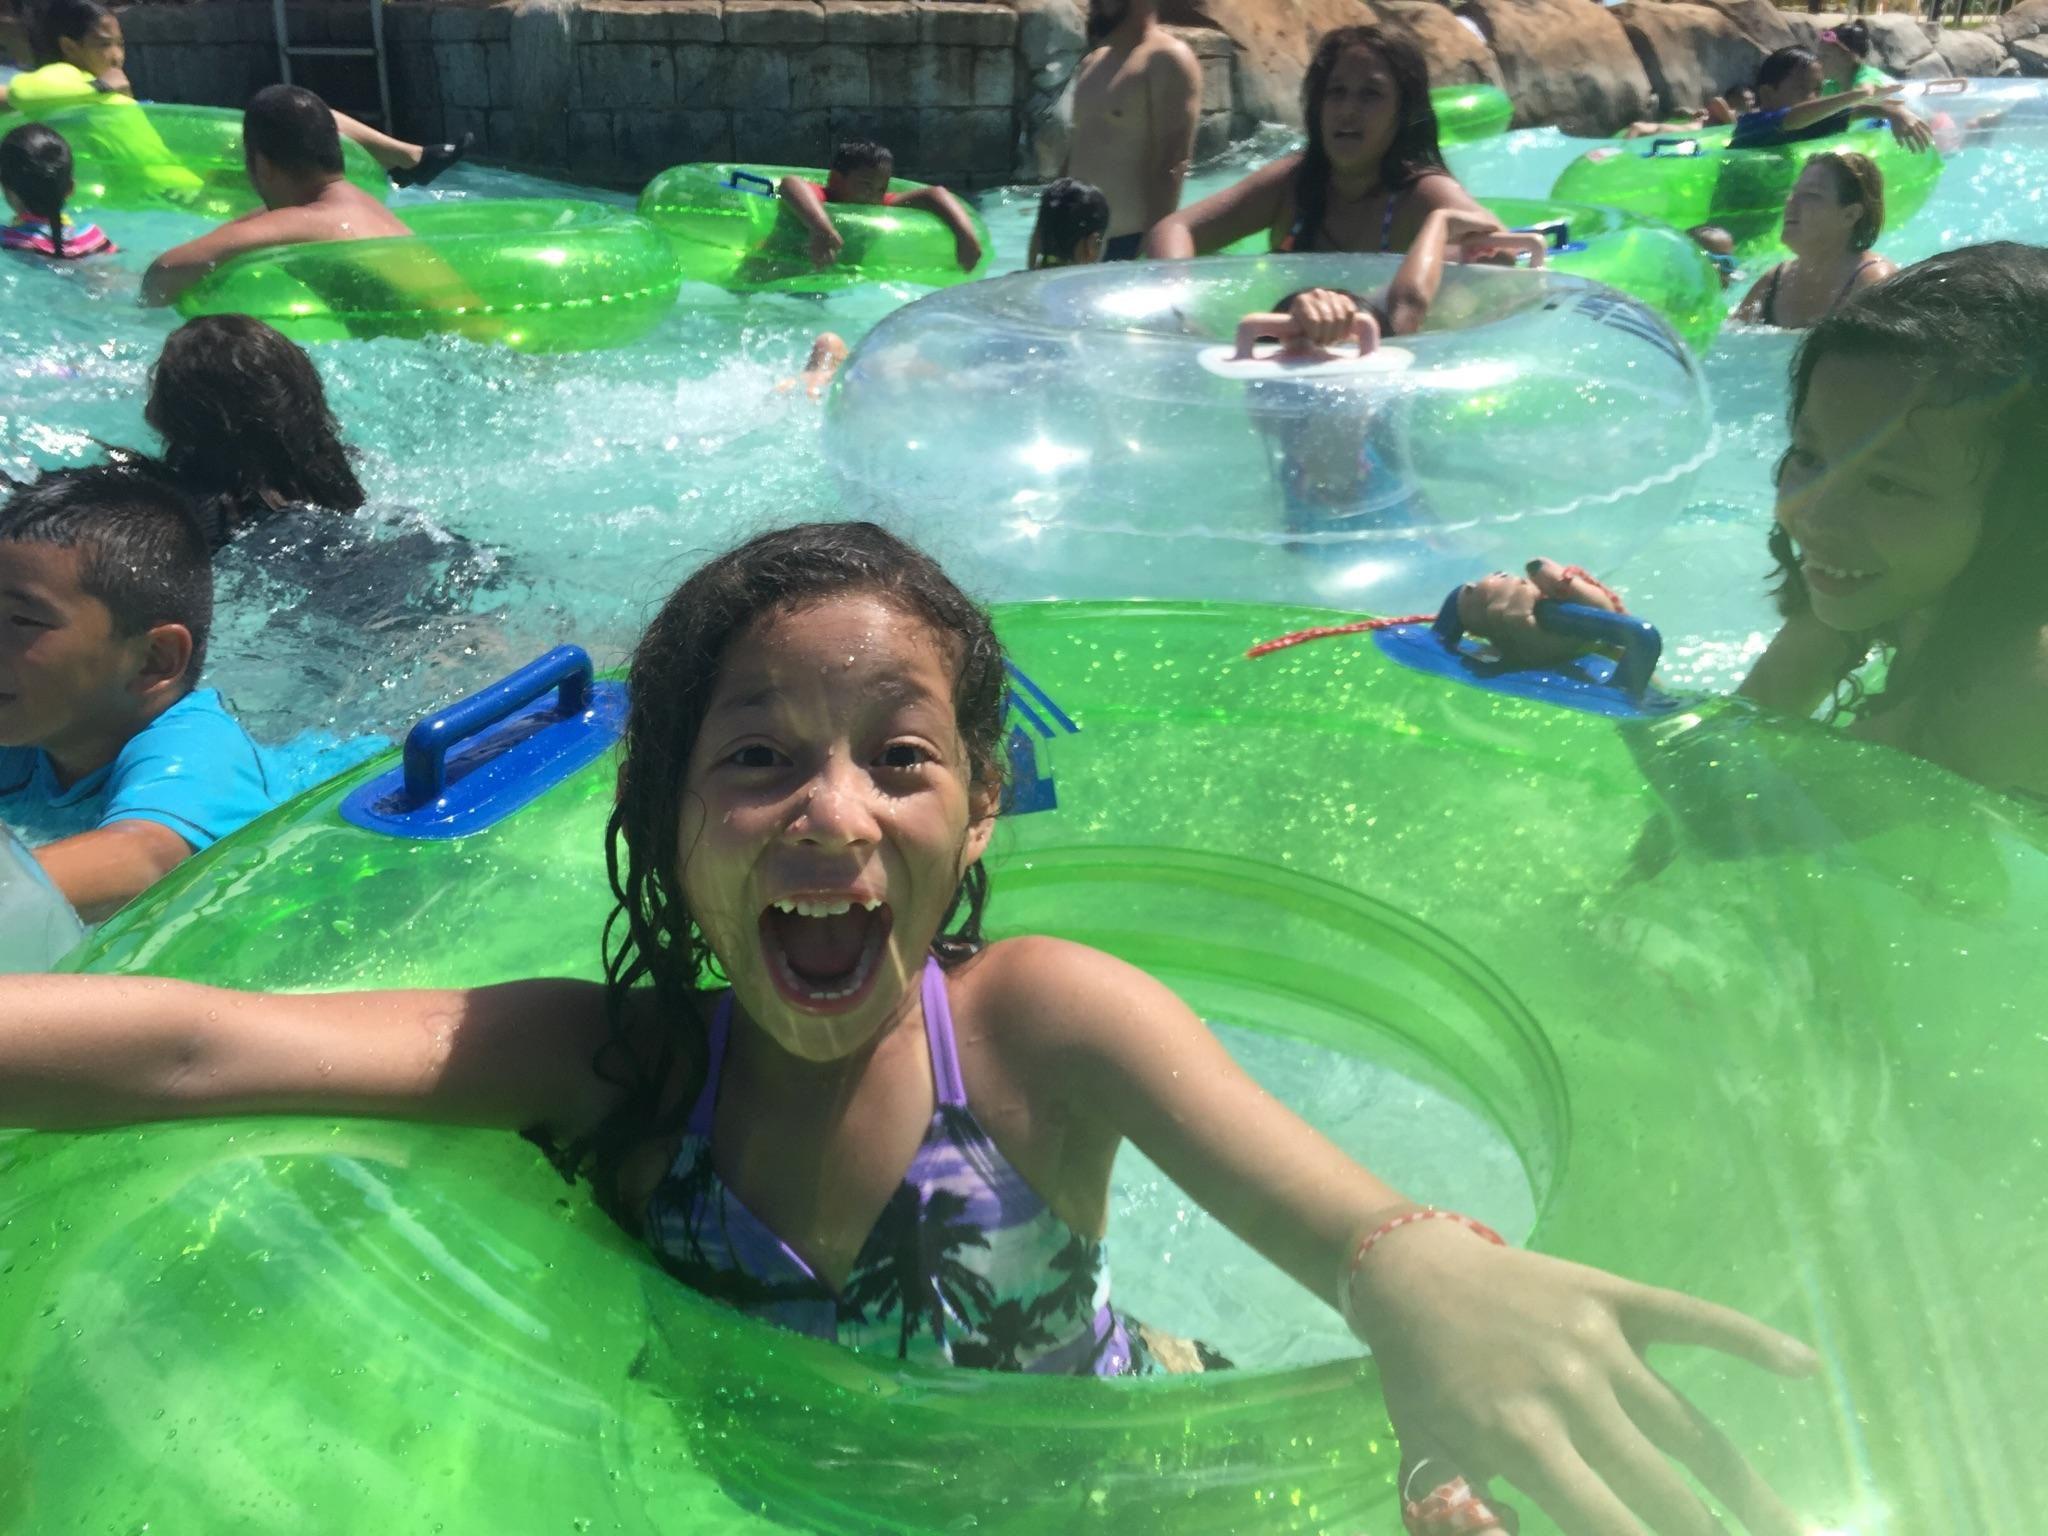 SUMMER CAMPS IN HAWAII!!! Kamaaina Kids Summer Camp Oahu ...